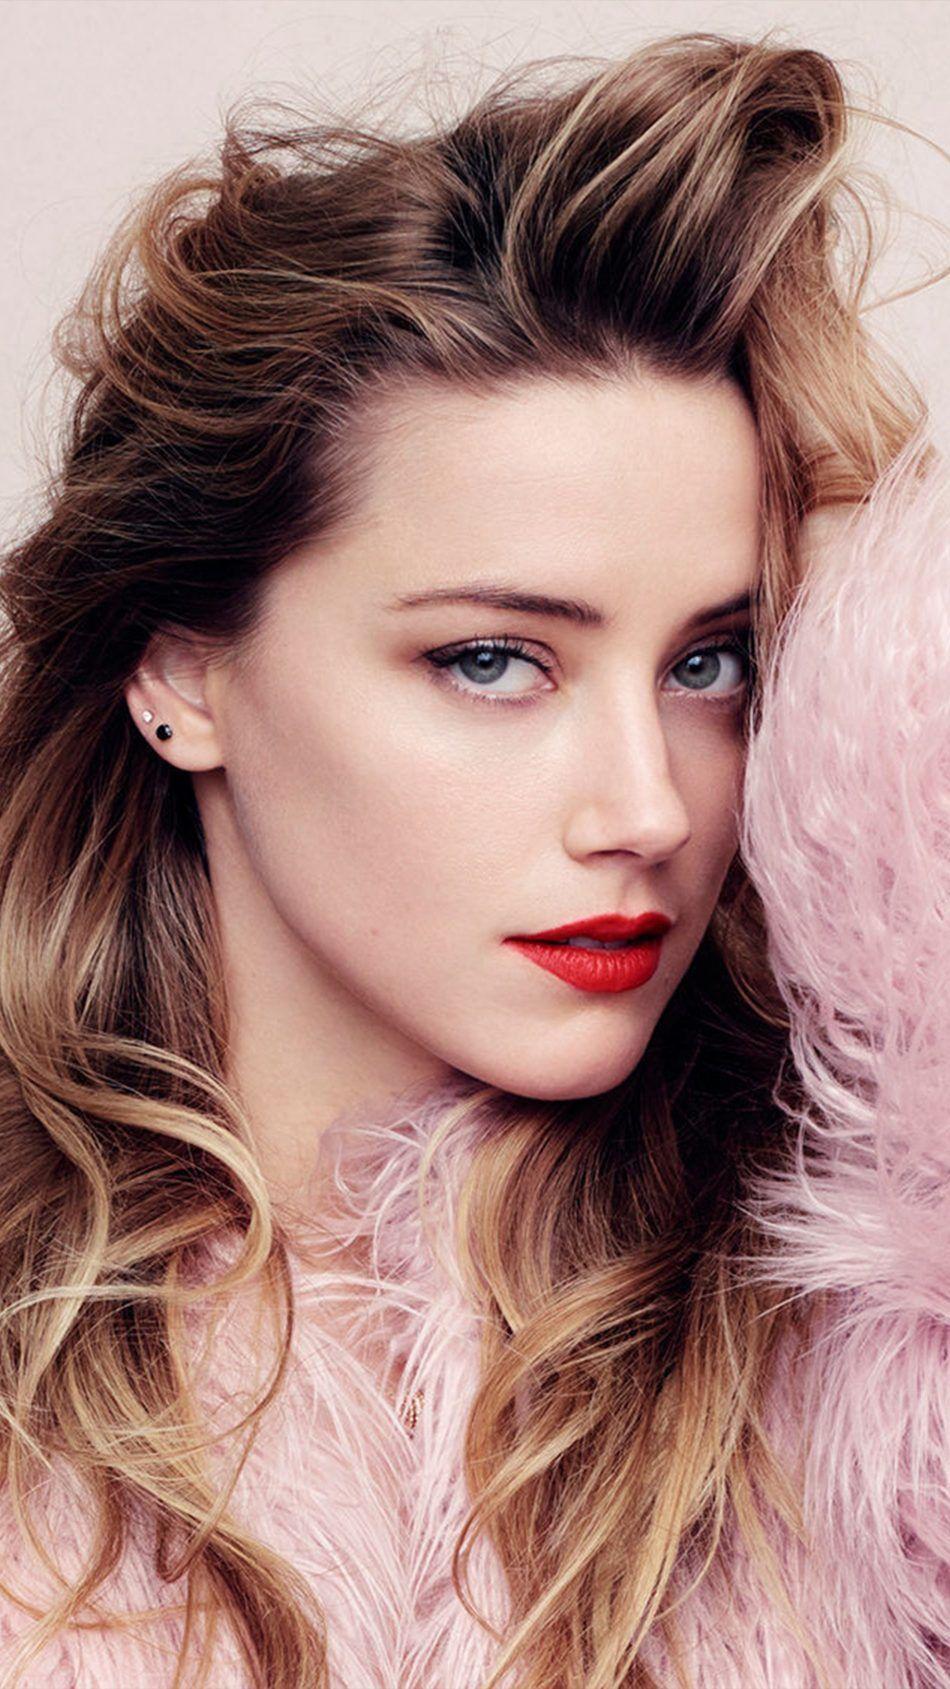 100 Best Amber Heard Images In 2020 Amber Heard Amber Amber Heard Hot